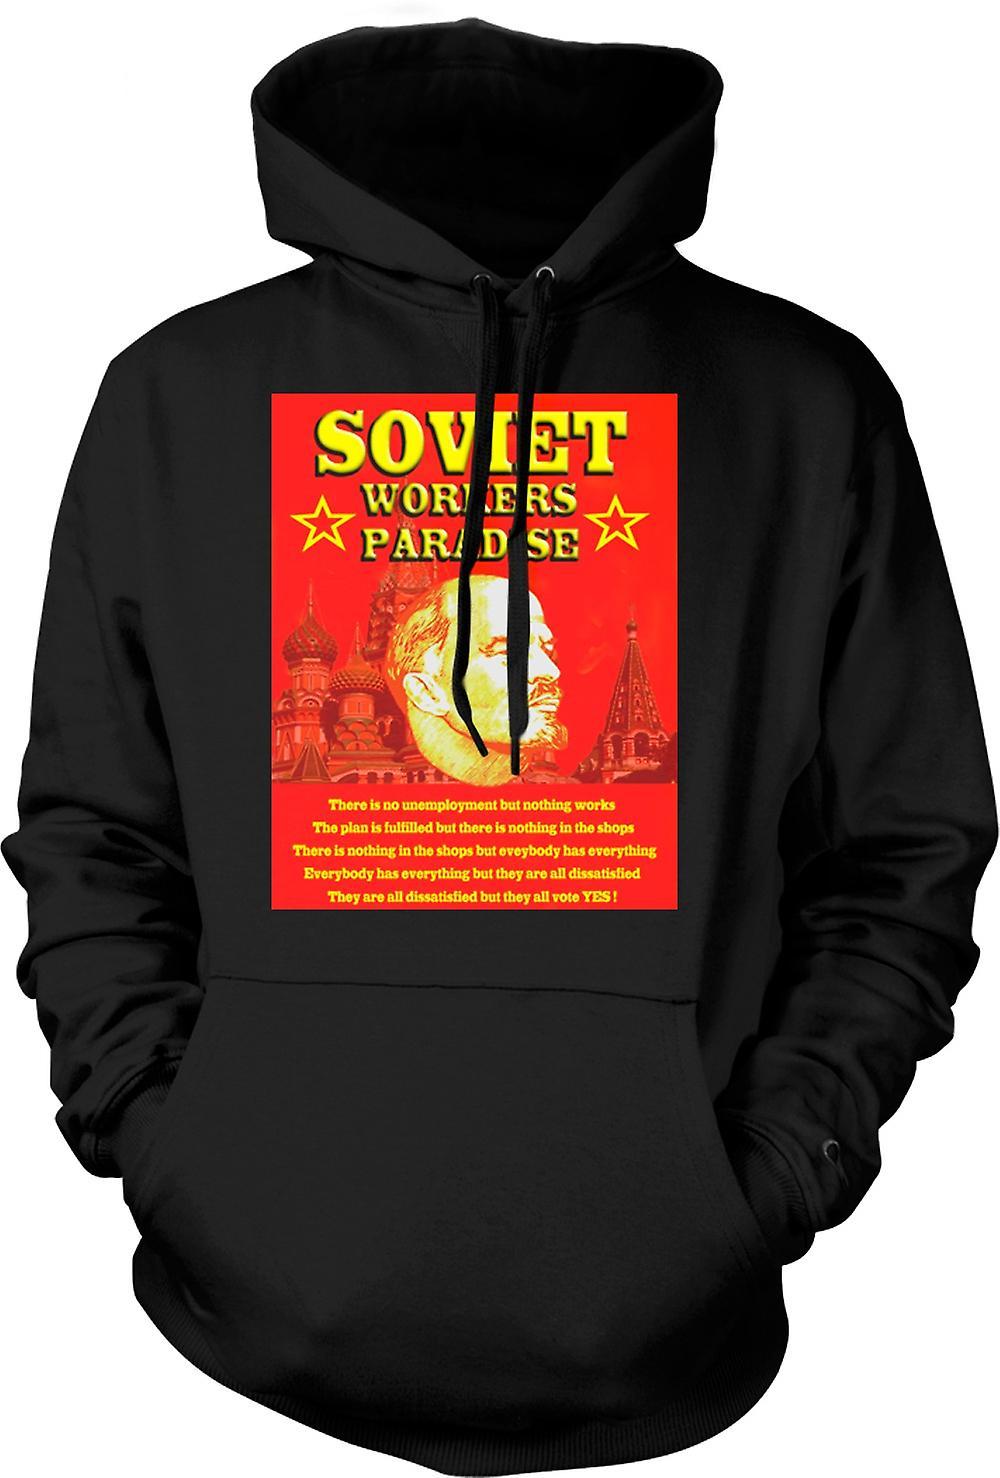 Mens Hoodie - Lenin - sovjetisk arbetare Paradise